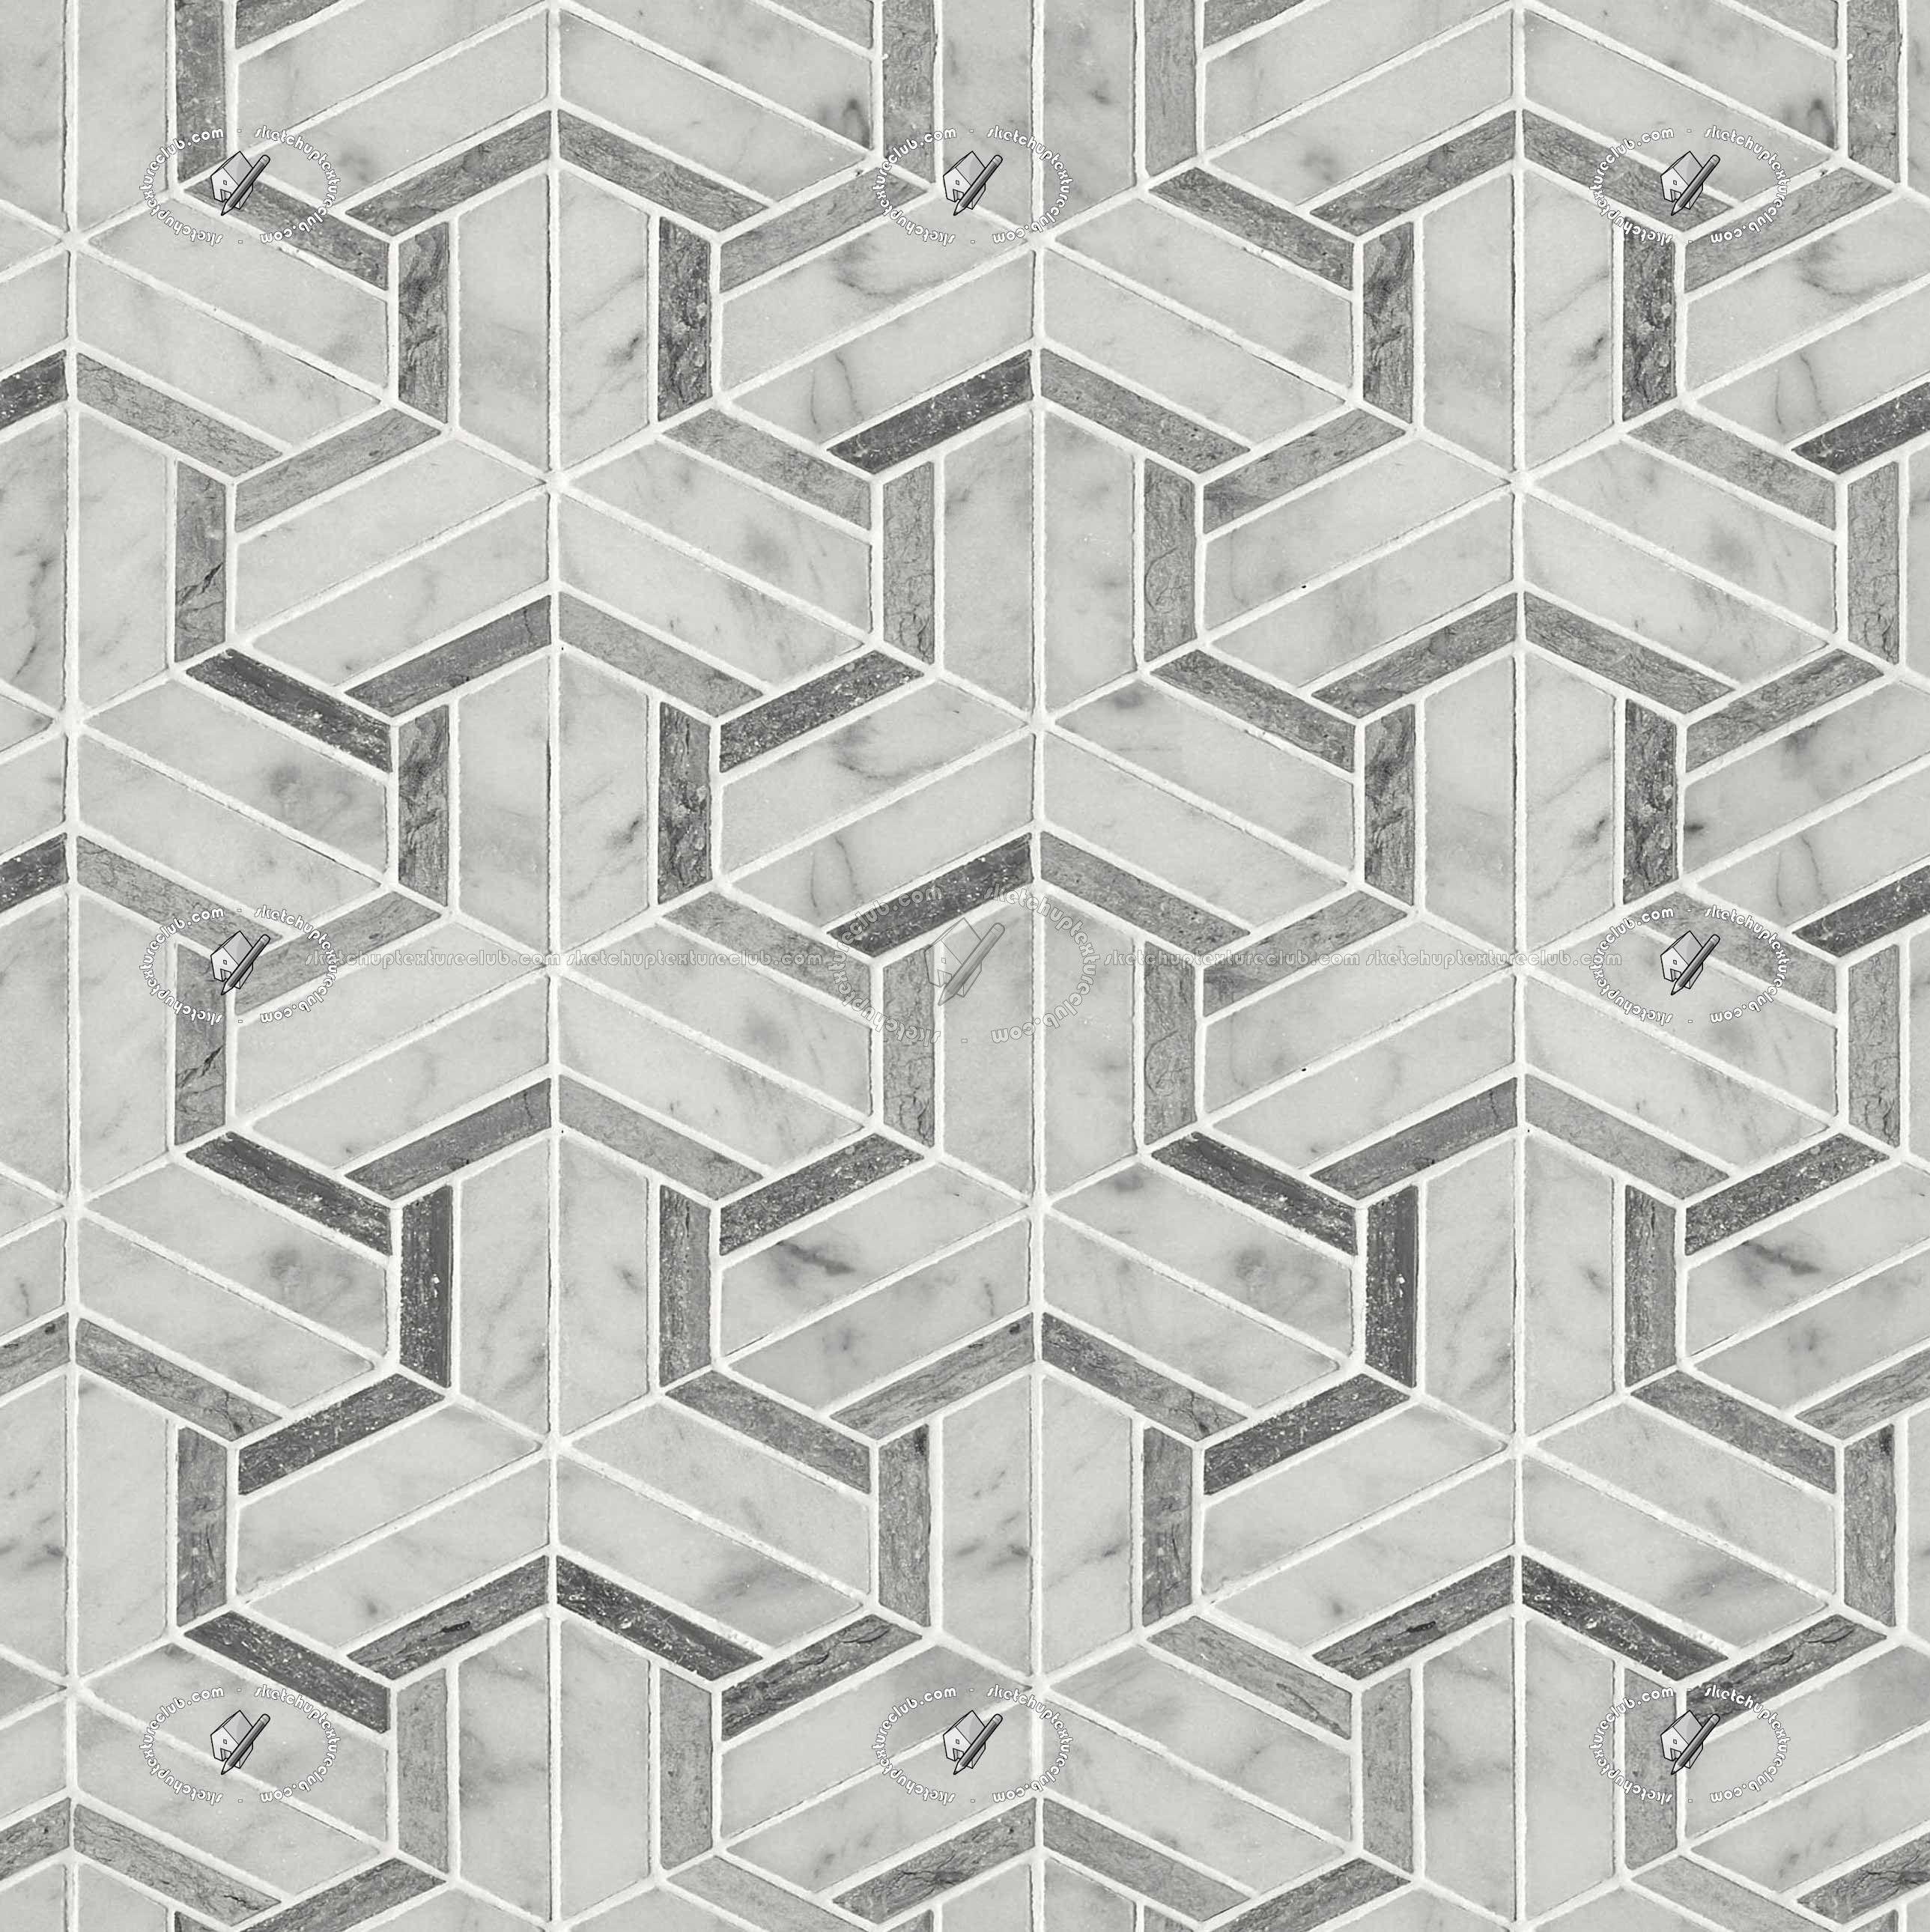 Marble Floor Tiles Geometric Patterns Texture Seamless Geometric